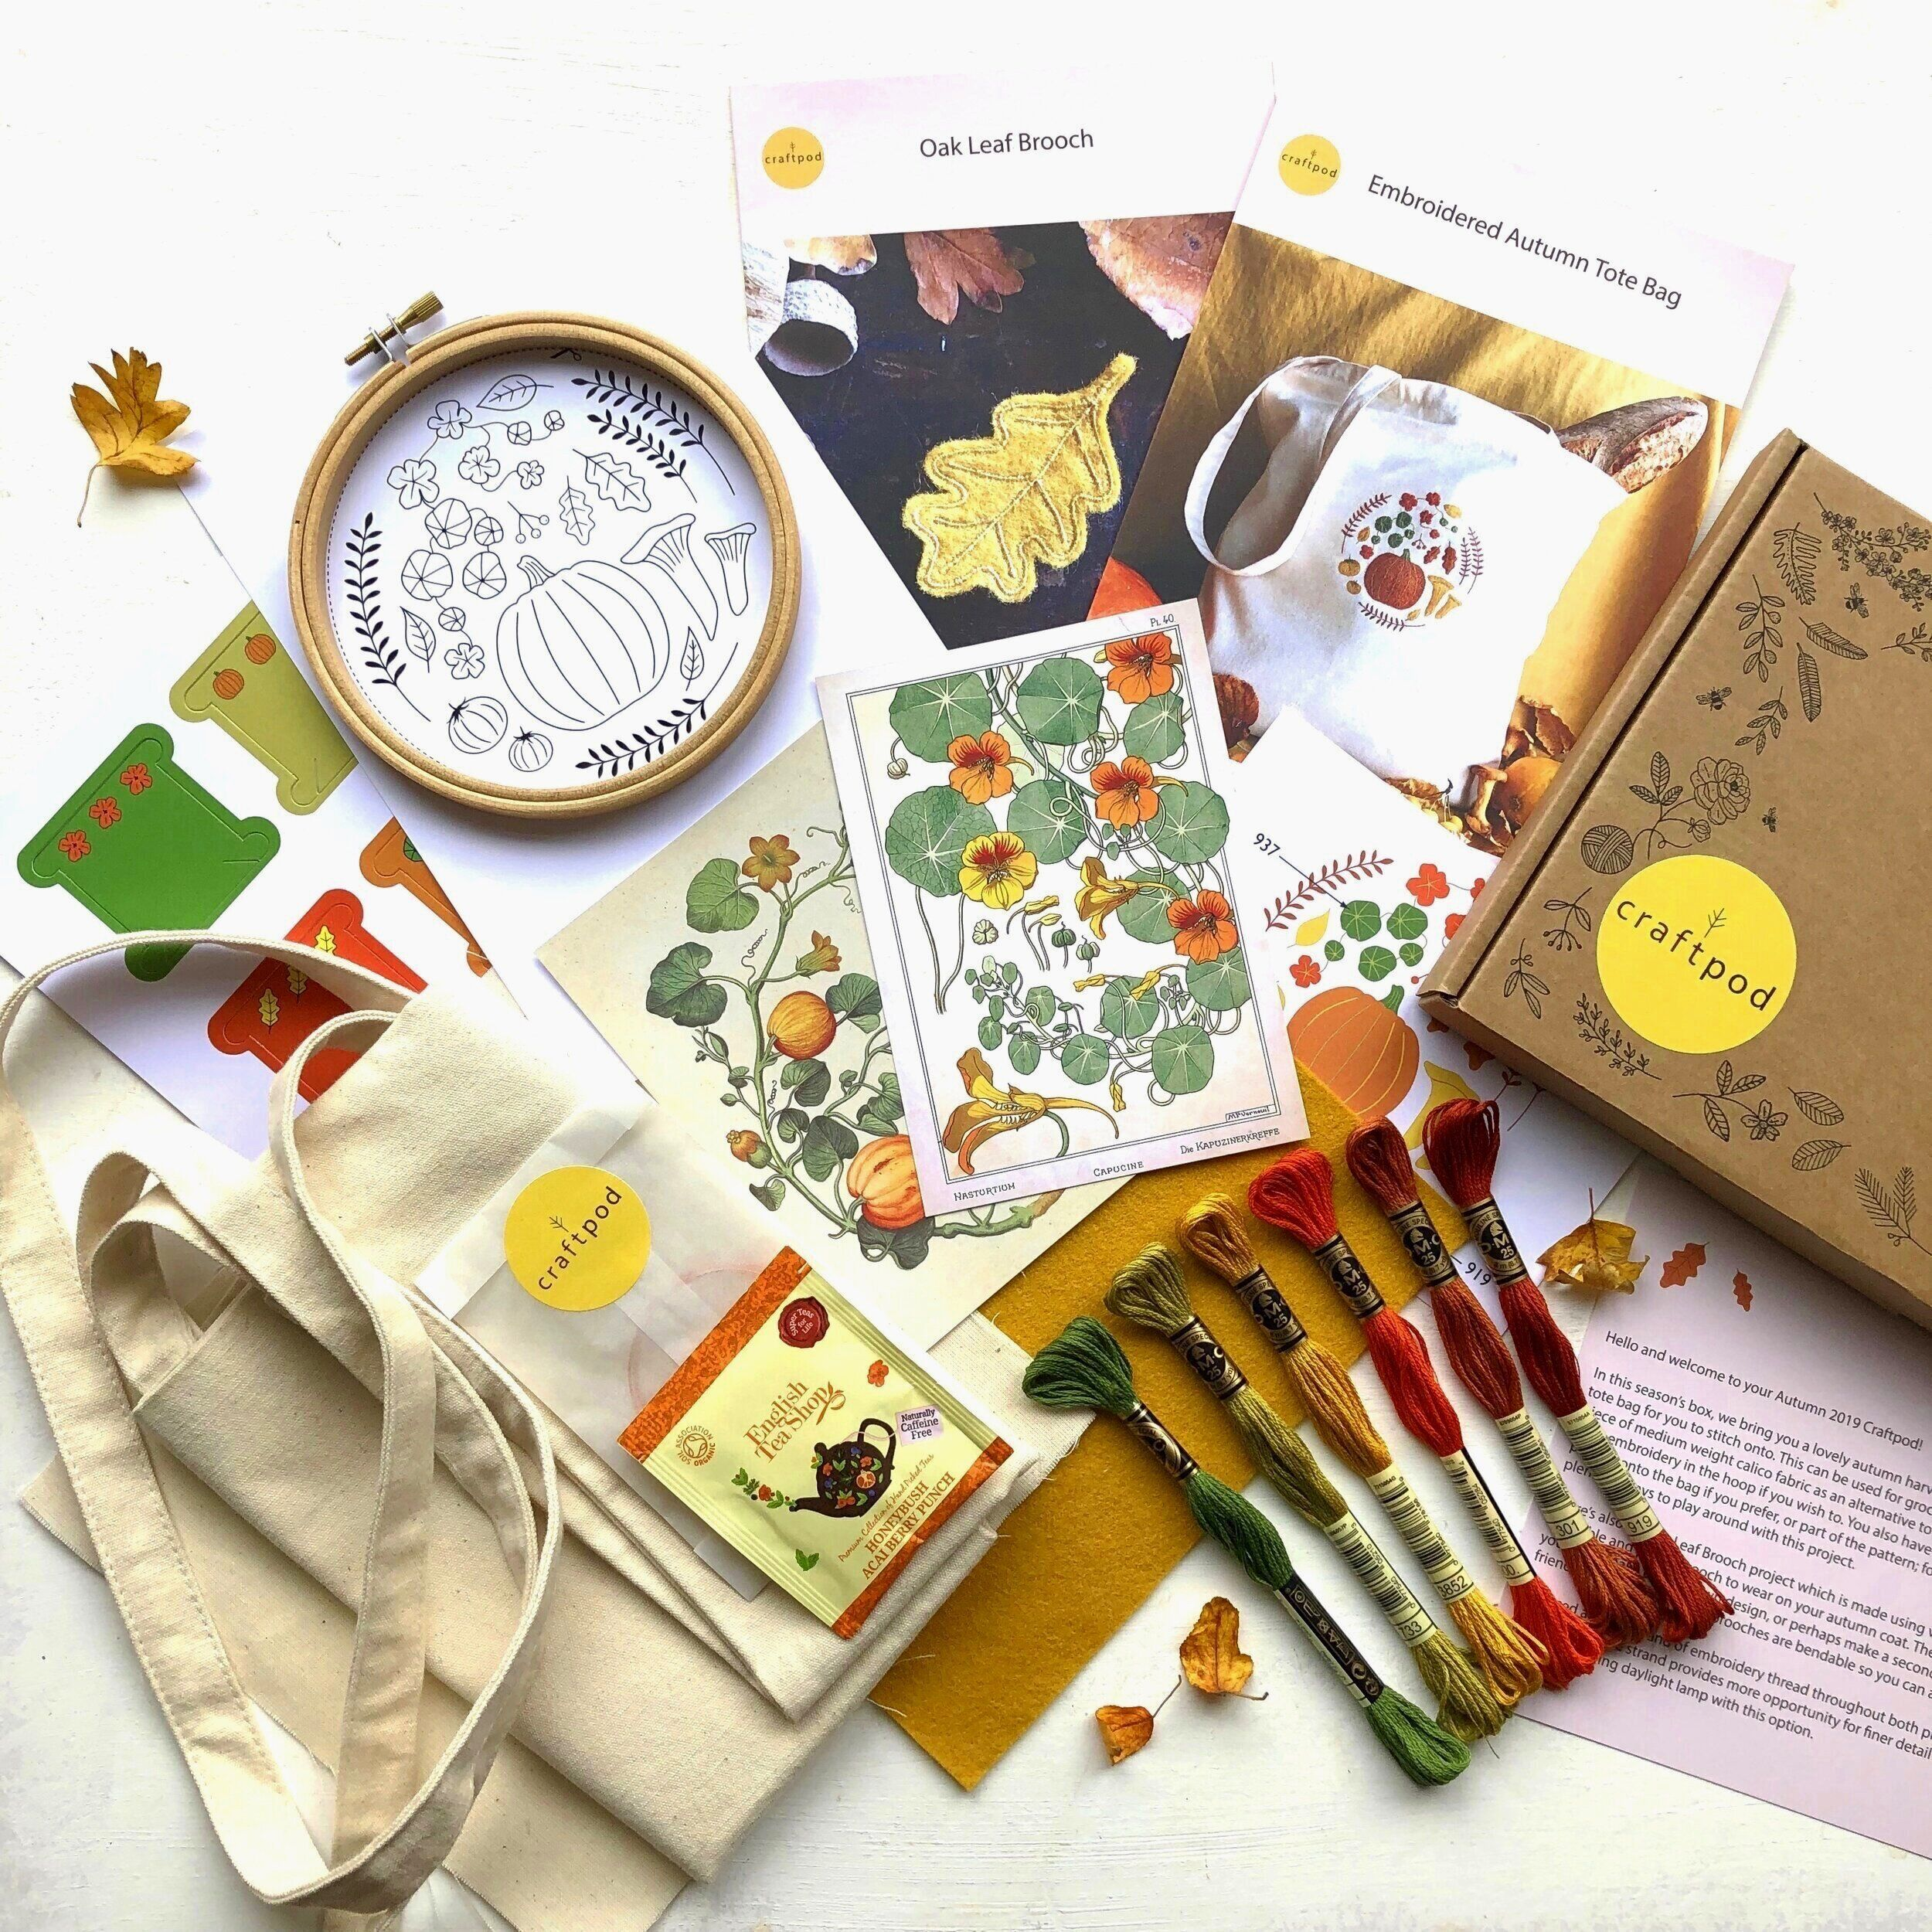 Craftpod Craft Subscription Box Sewing Baking And Other Seasonal Surprises Craft Box Subscription Crafts Craft Subscription